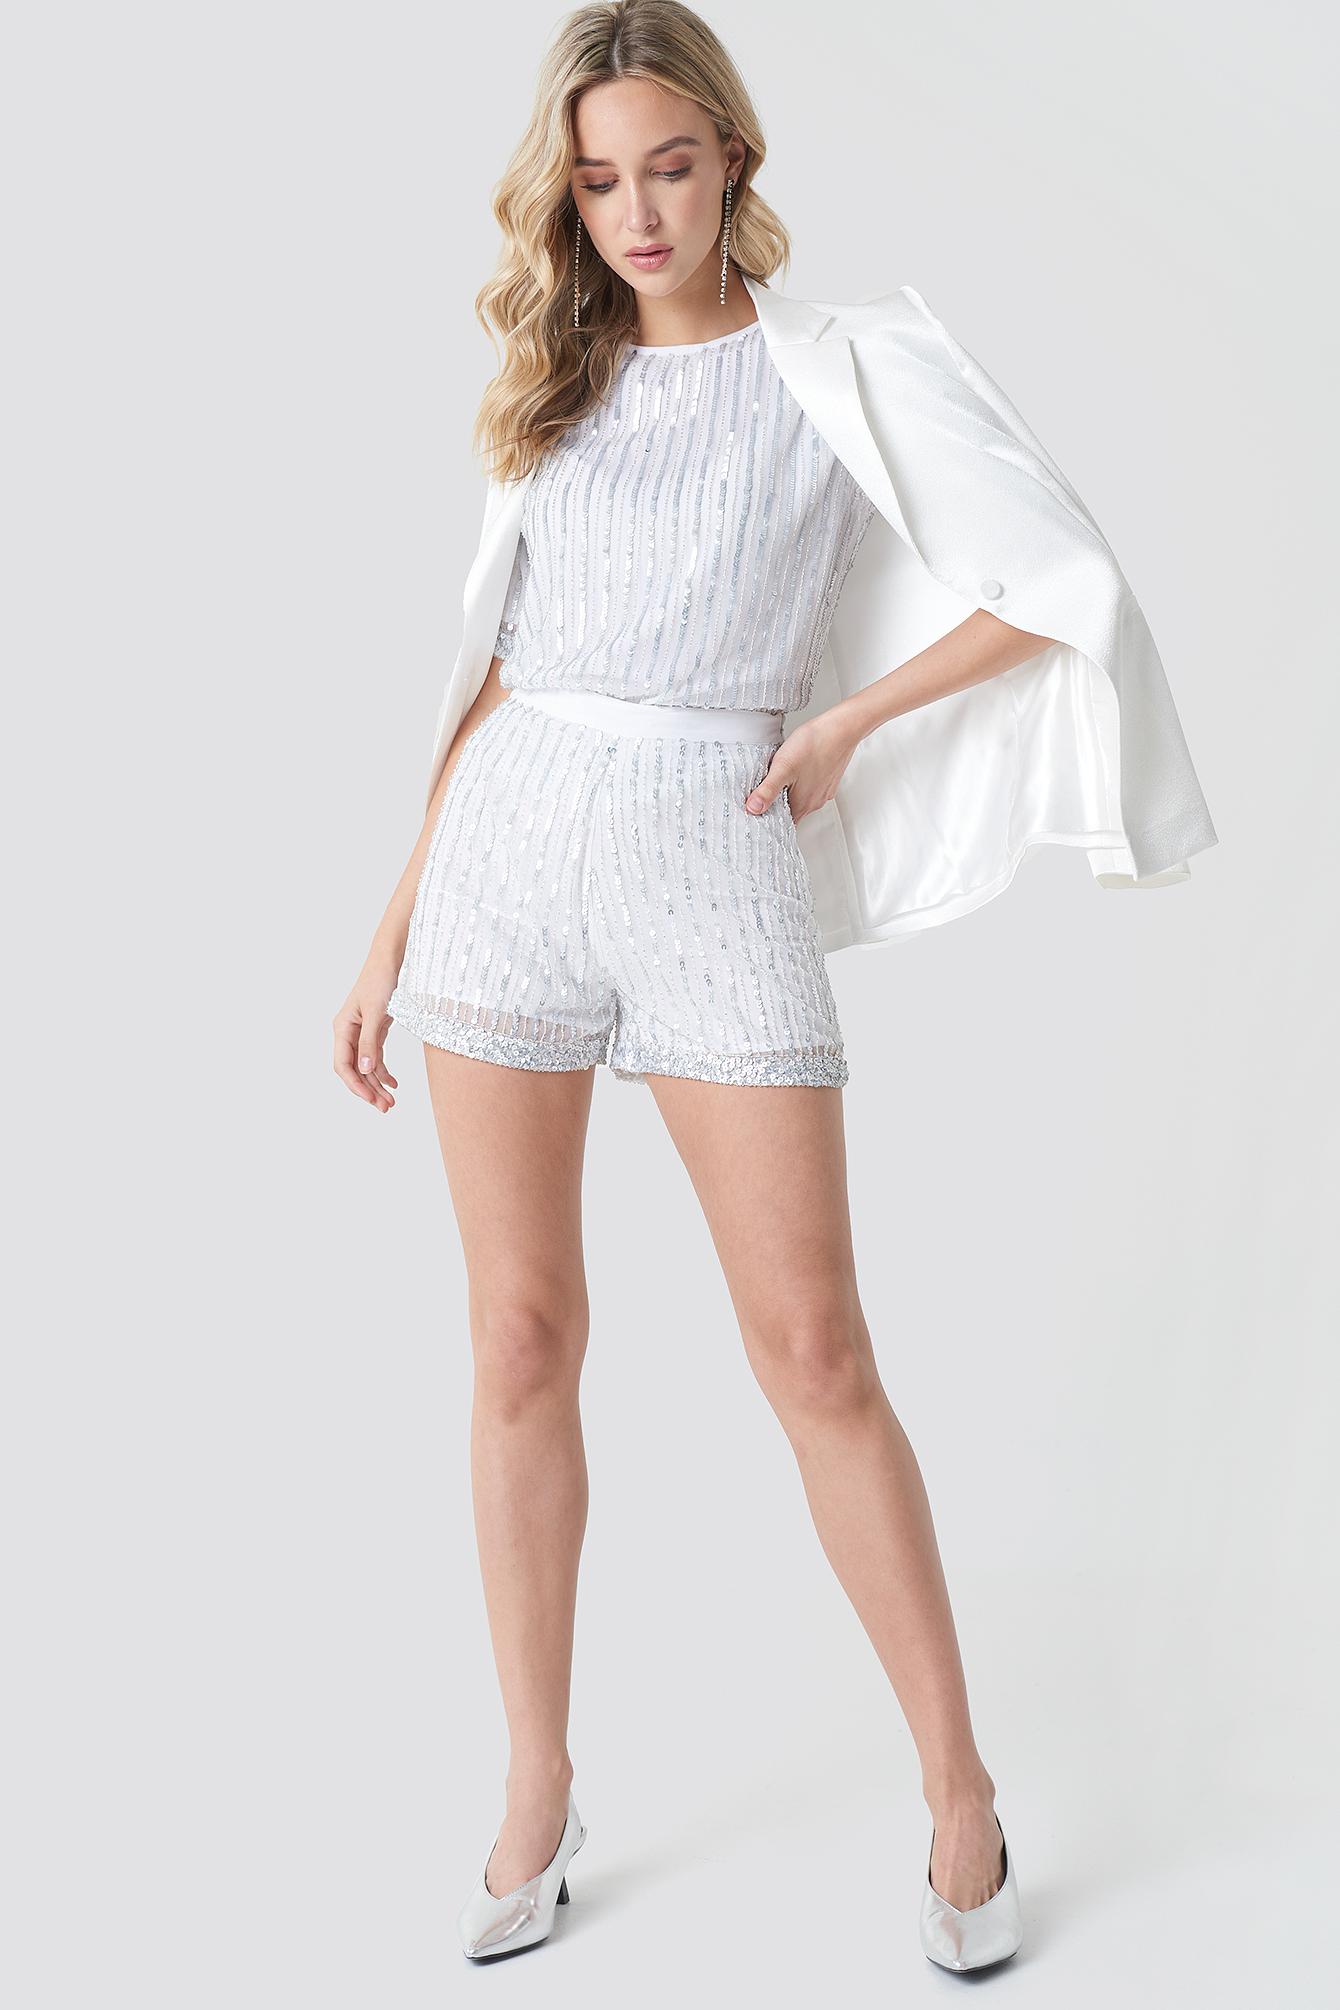 NA-KD Sequins Shorts Jeu Geniue Stockiste V2TayG2kN